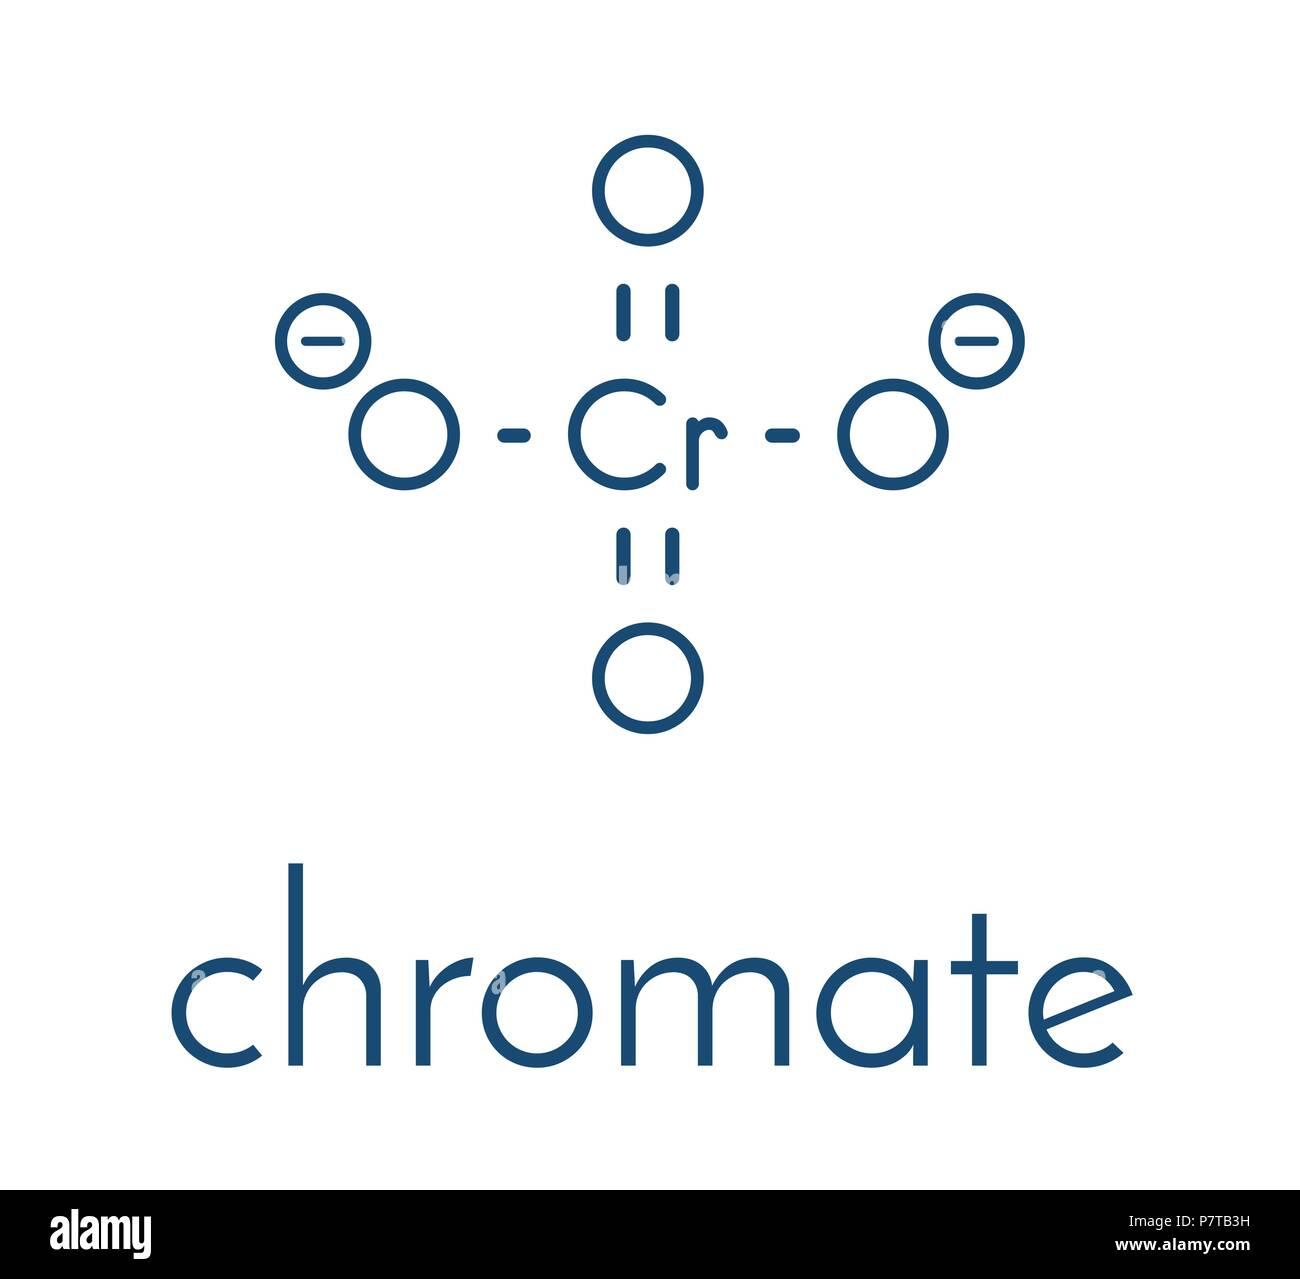 Chromate Stock Photos & Chromate Stock Images - Alamy